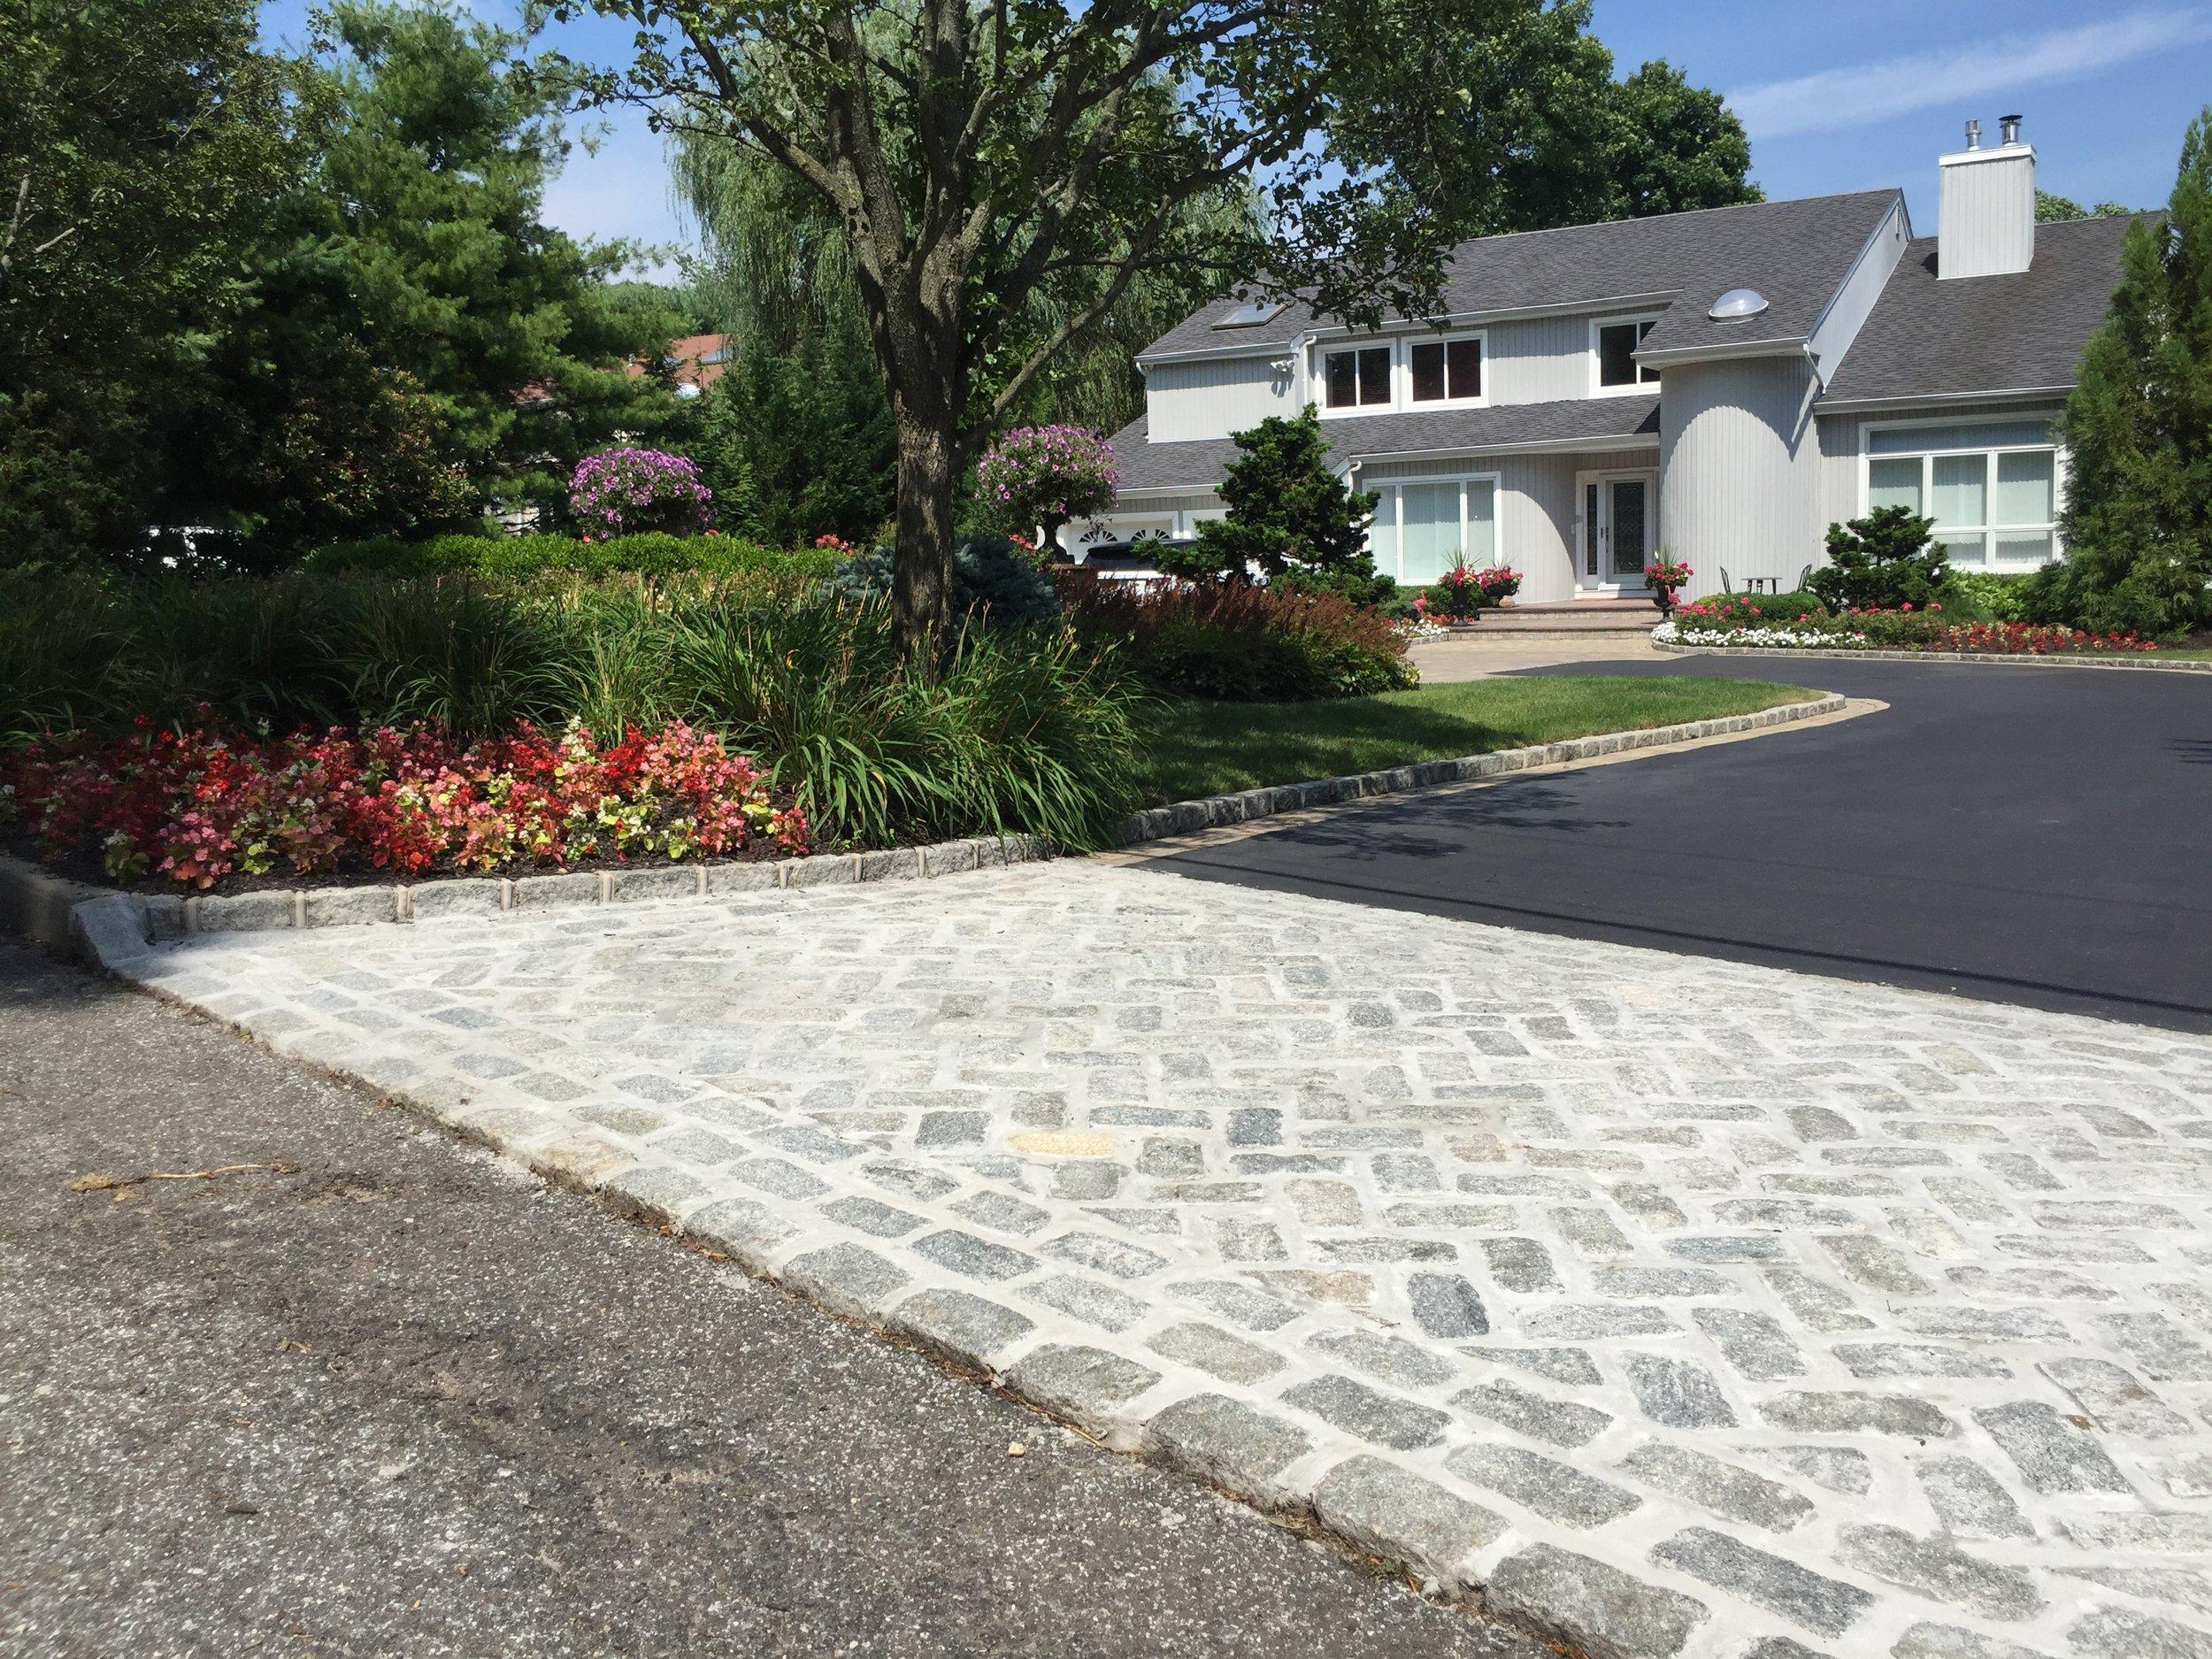 Professional hardscape paver company in Long Island, NY